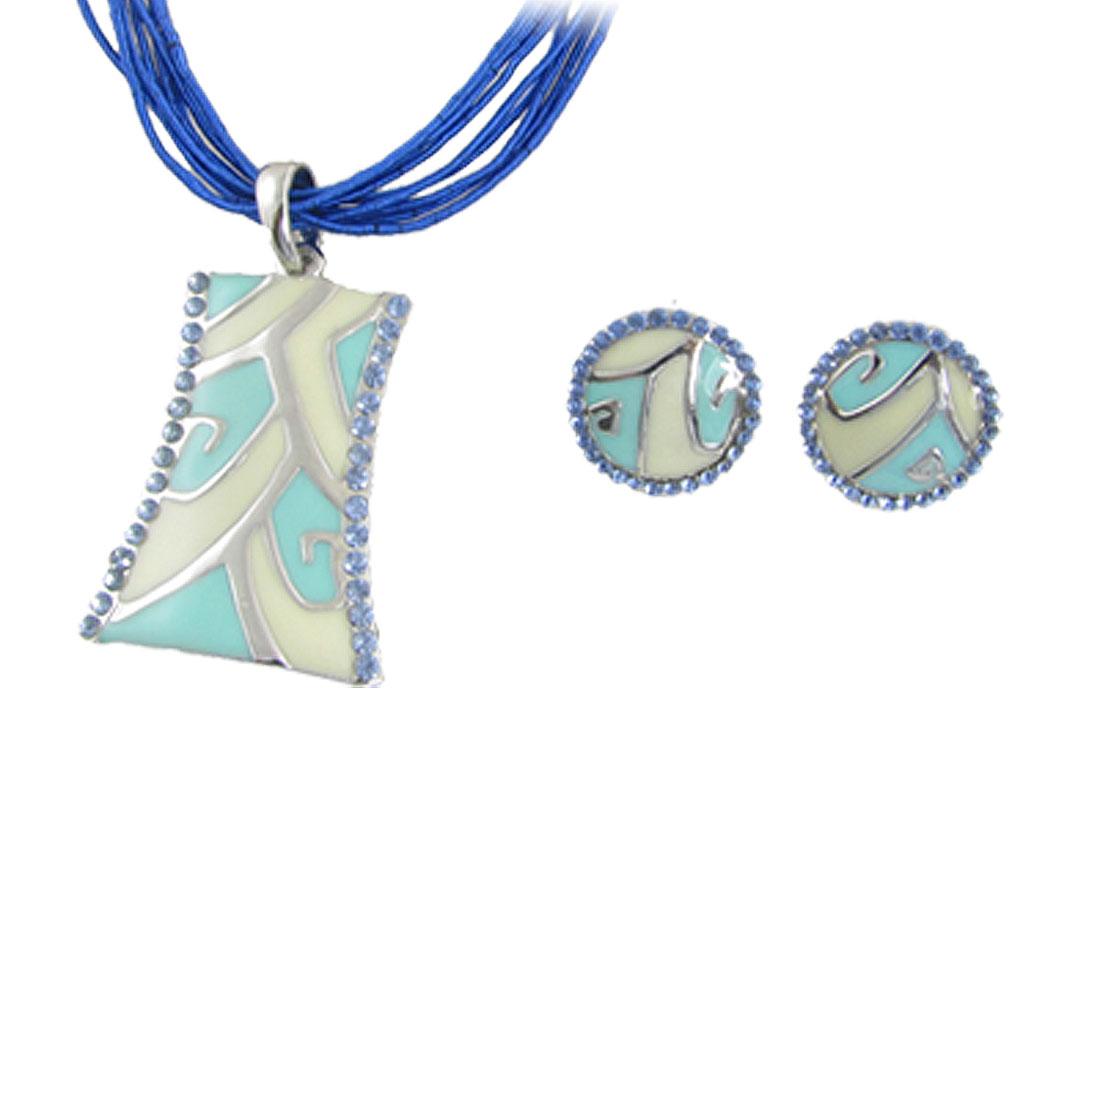 Silver Tone Lobster Clasp Multi Strings Necklace w Stud Earrings